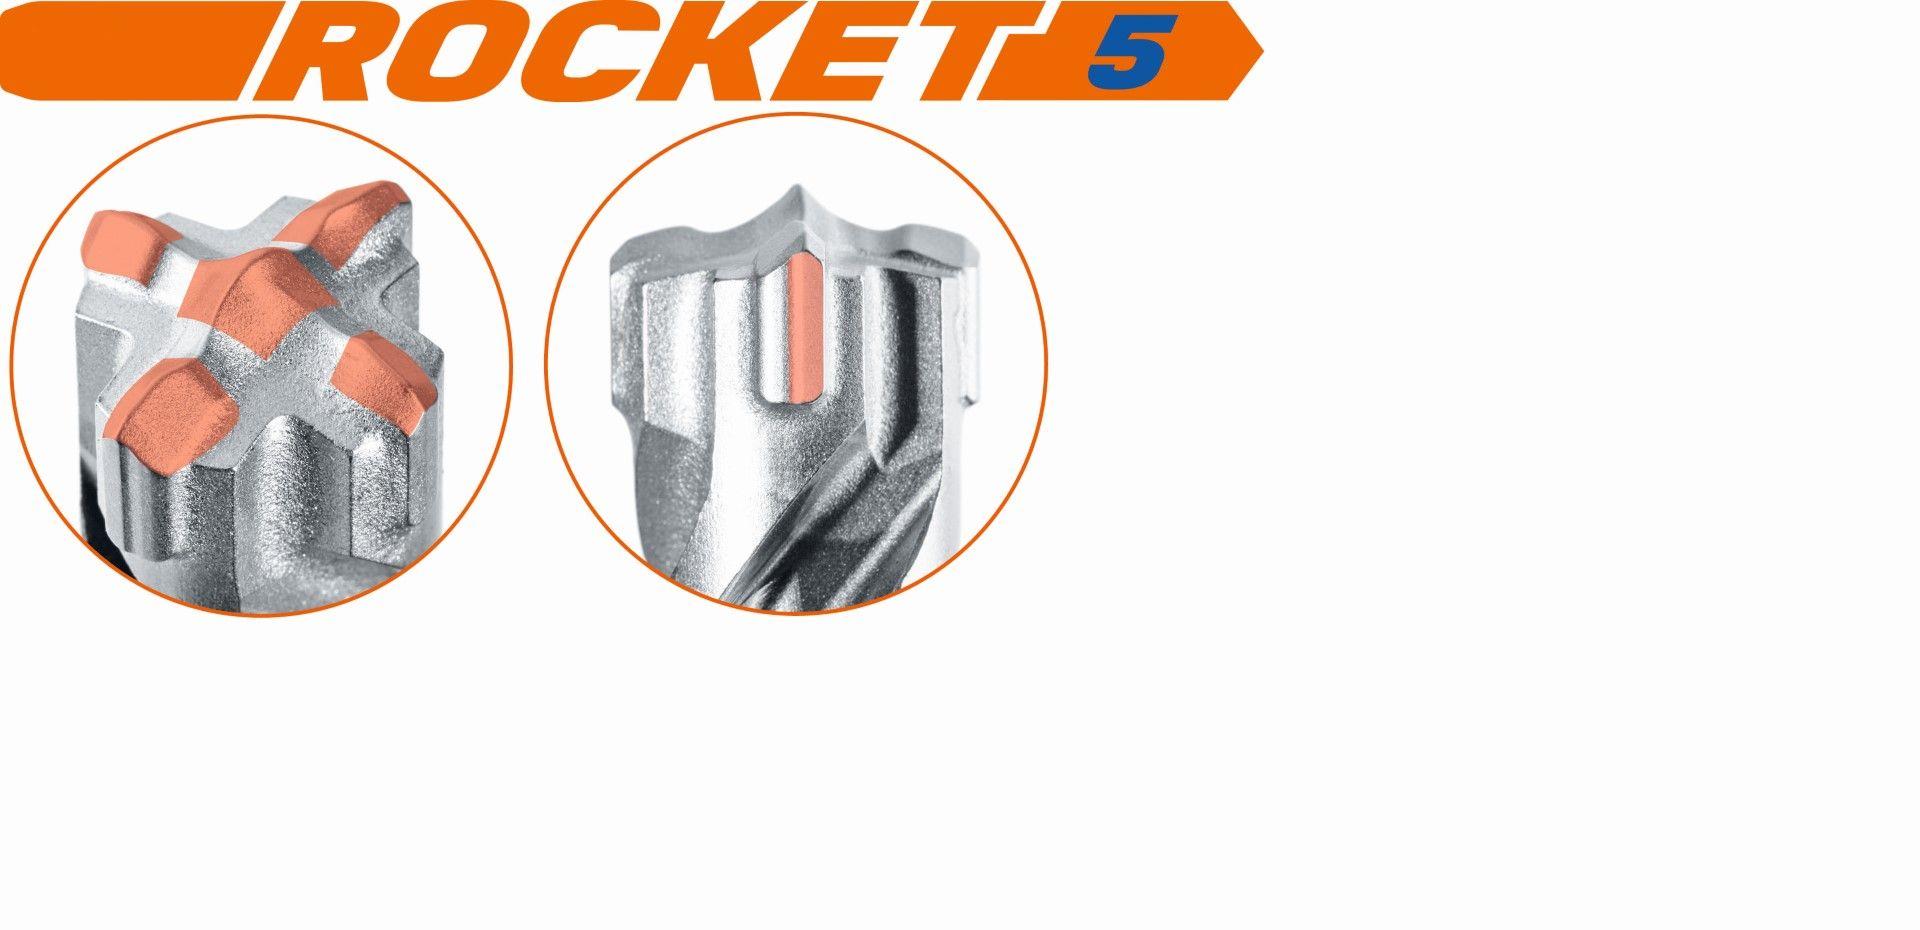 Slika BORER Rocket 5 SDS-plus 5x110 mm 4 kraka